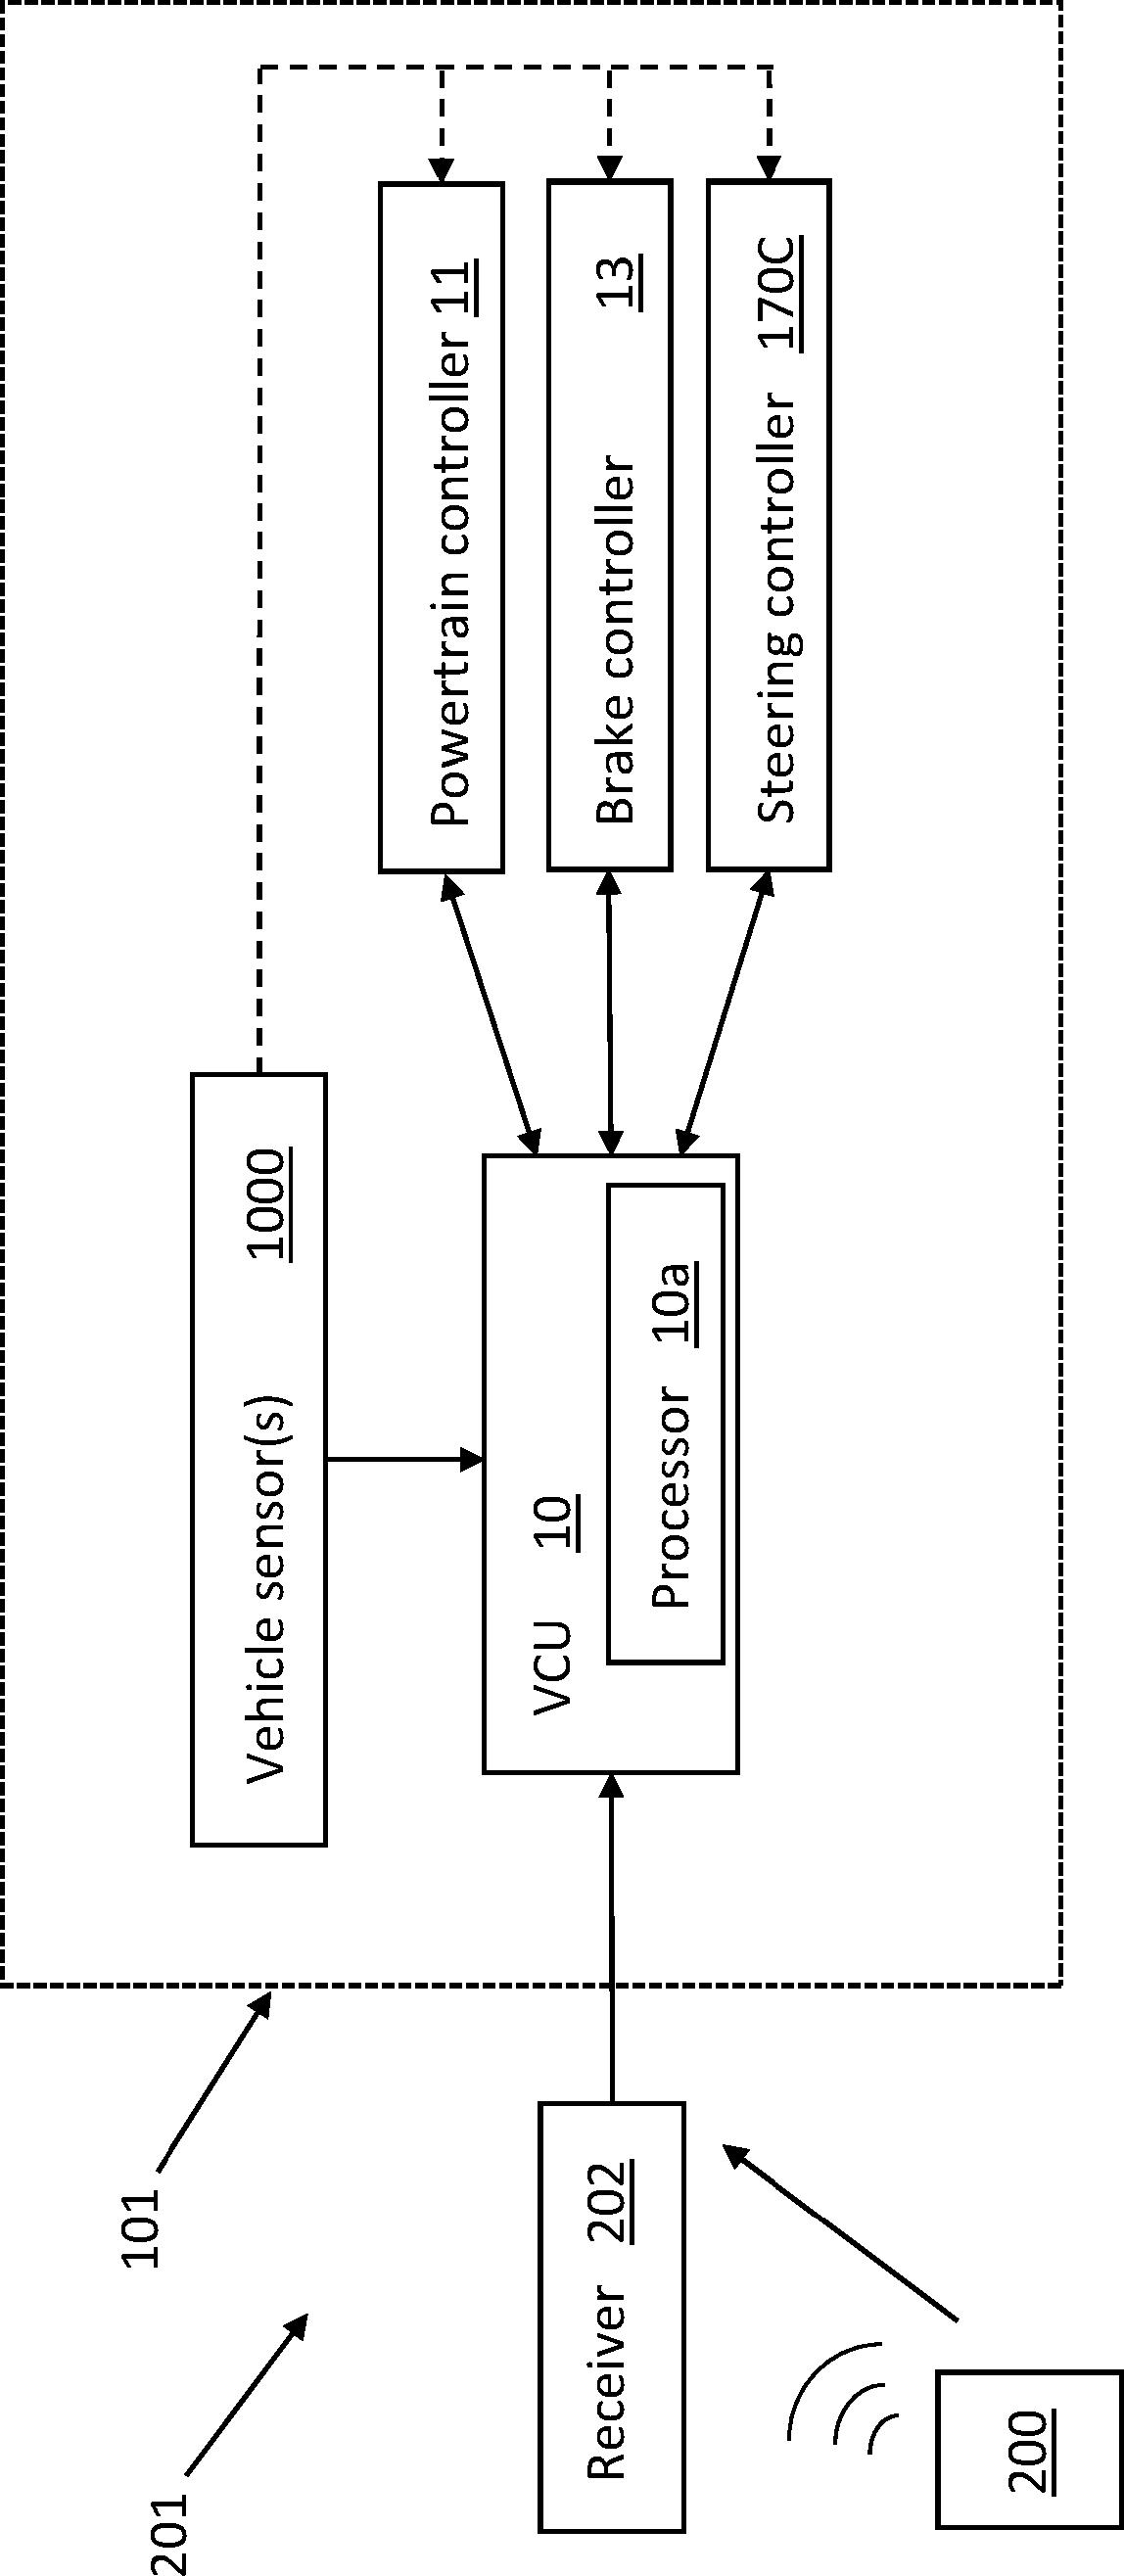 Figure GB2559168A_D0012